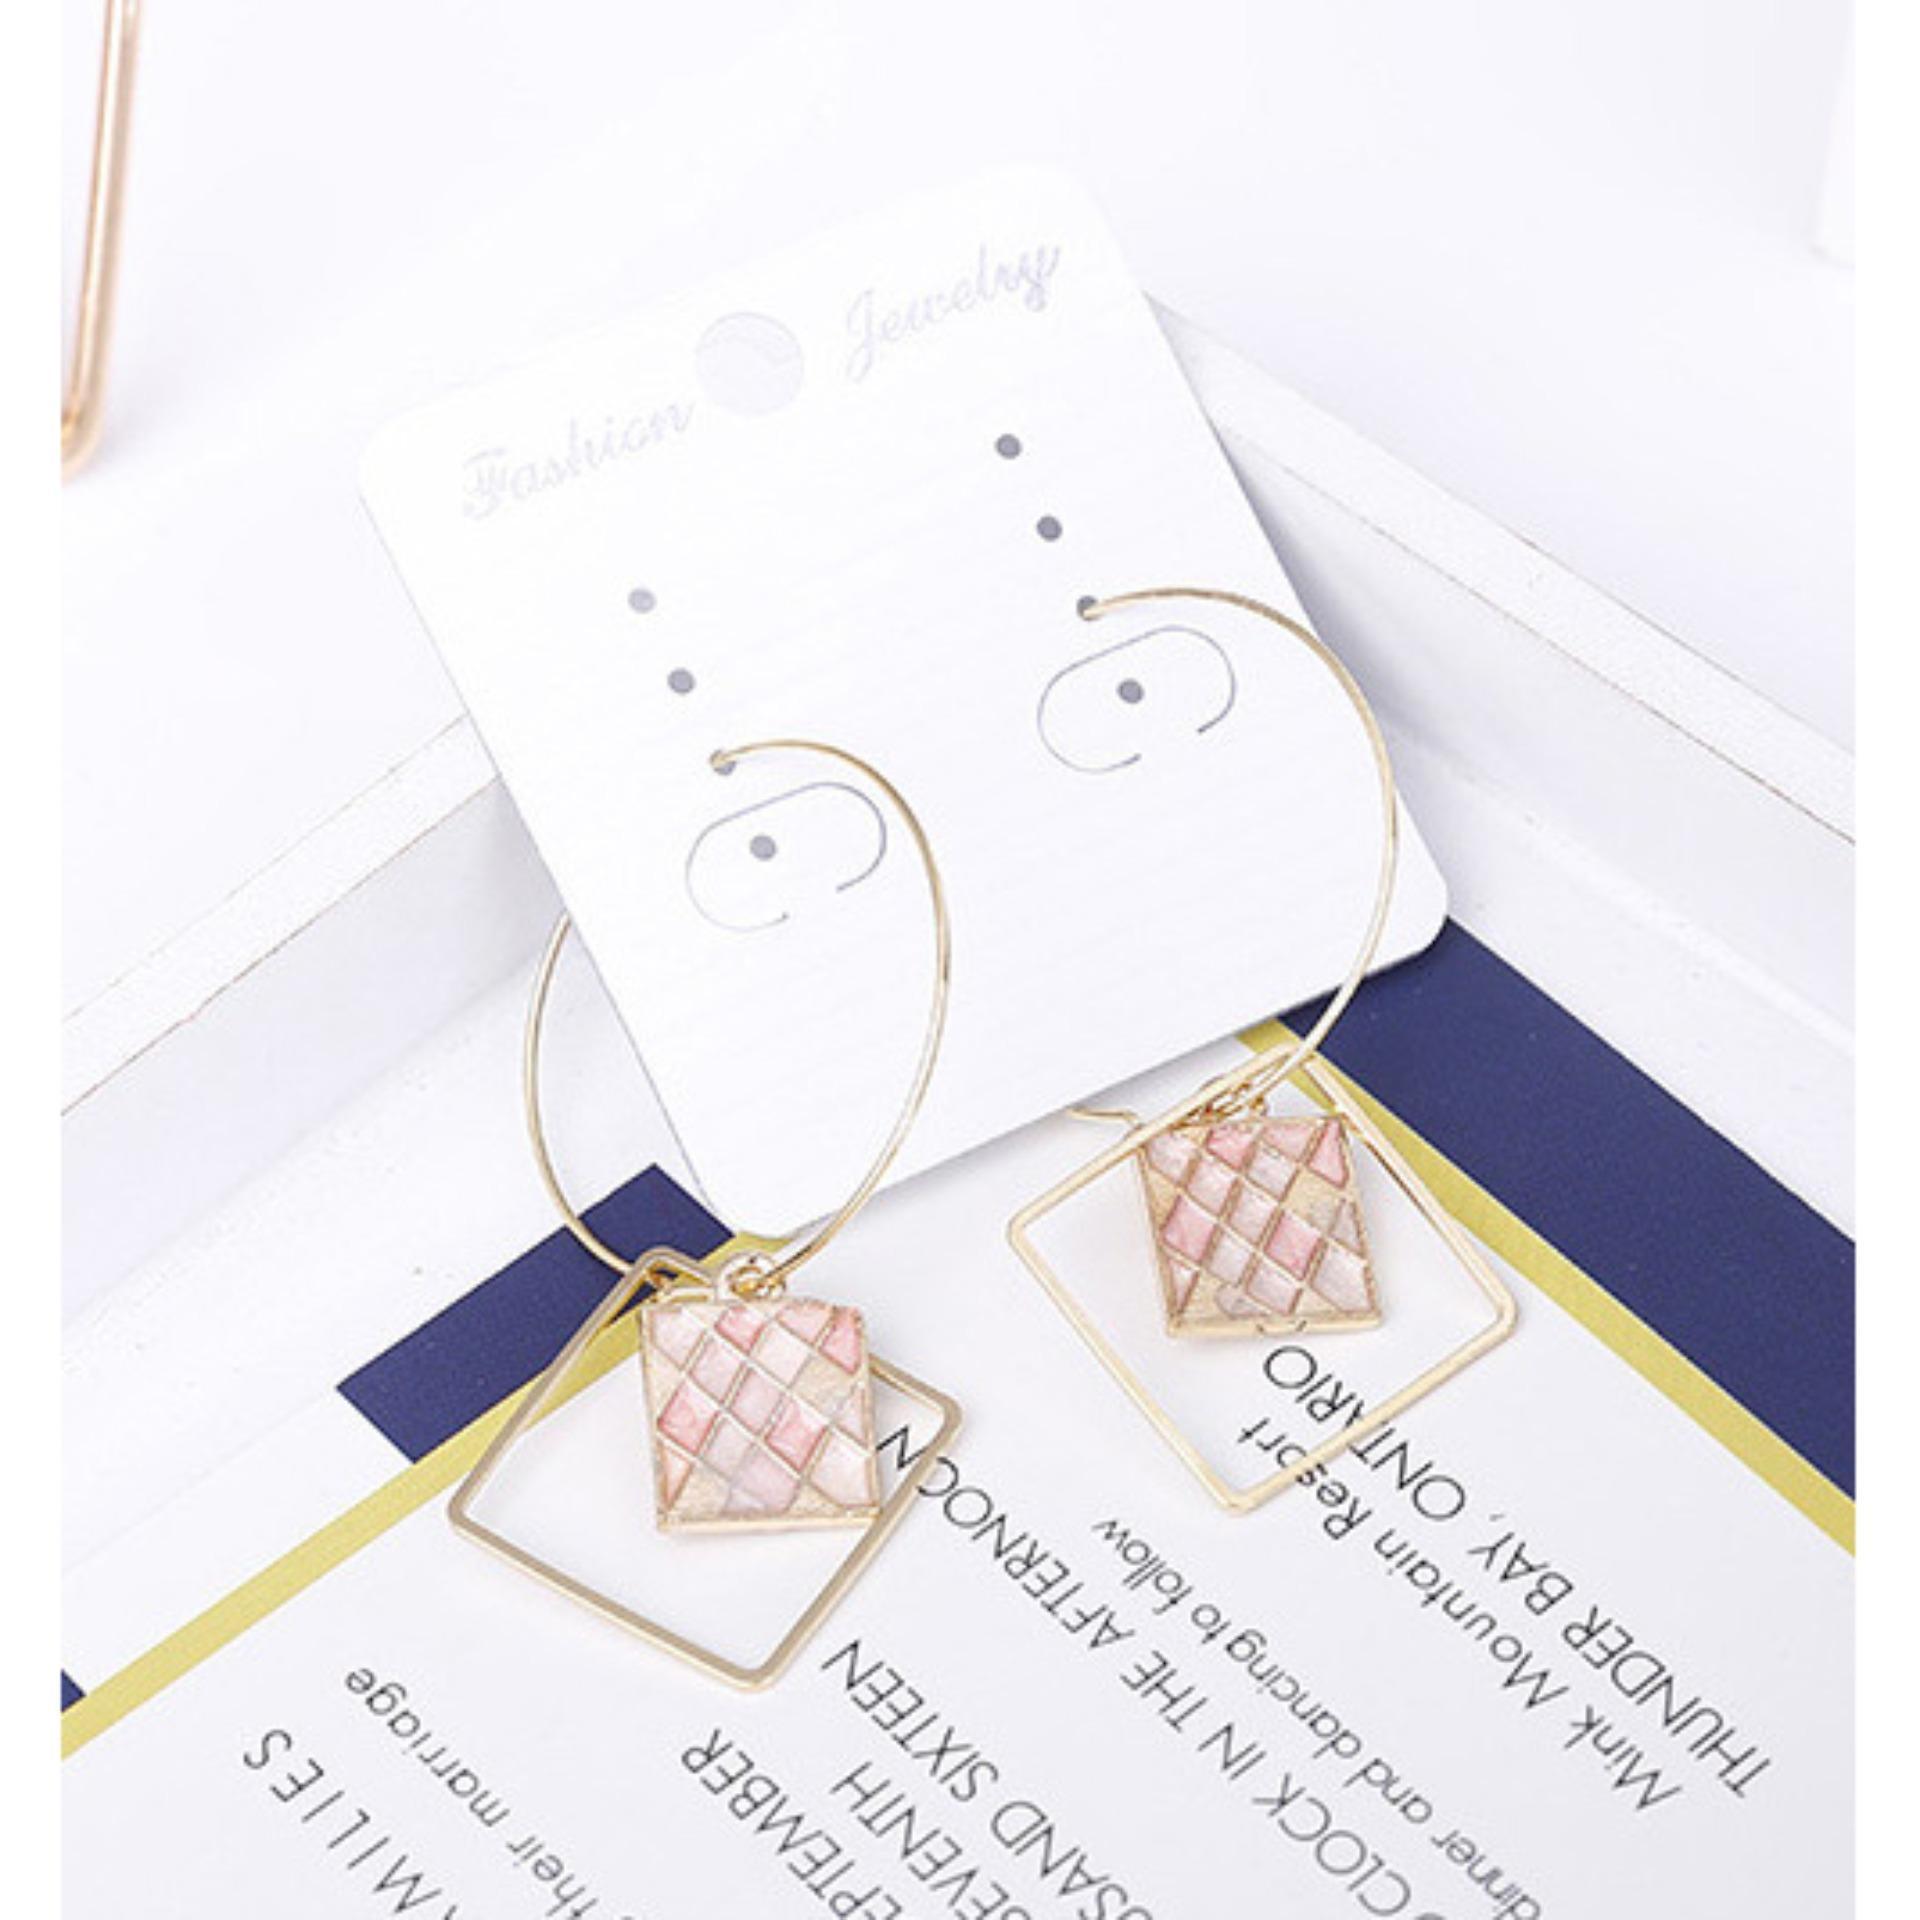 Shock Price LRC Anting Hoop Elegant Square Shape Decorated Earrings penjualan - Hanya Rp17.540